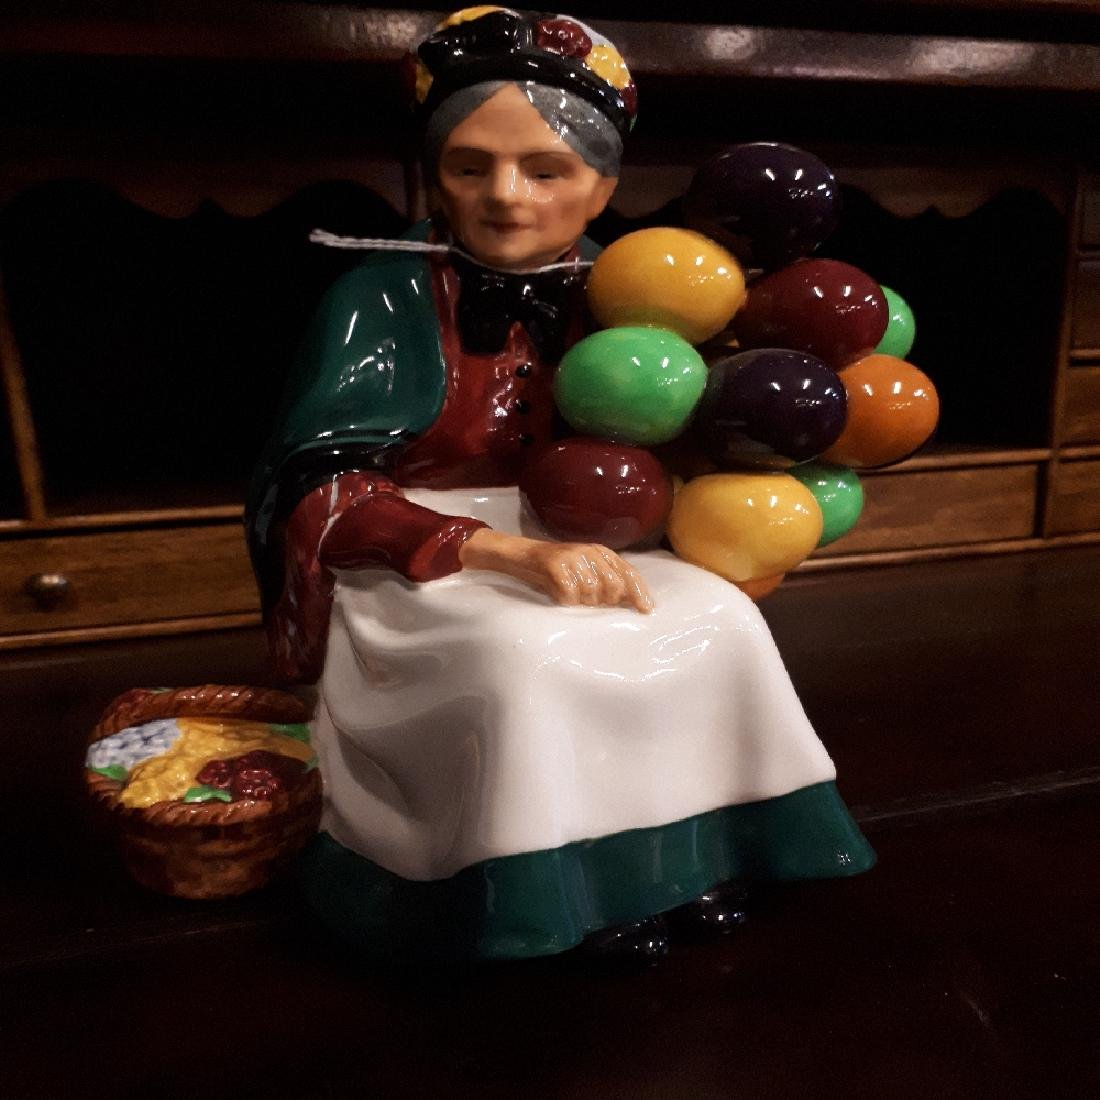 20th. C. Royal Doulton figurine Old Balloon Seller, HN